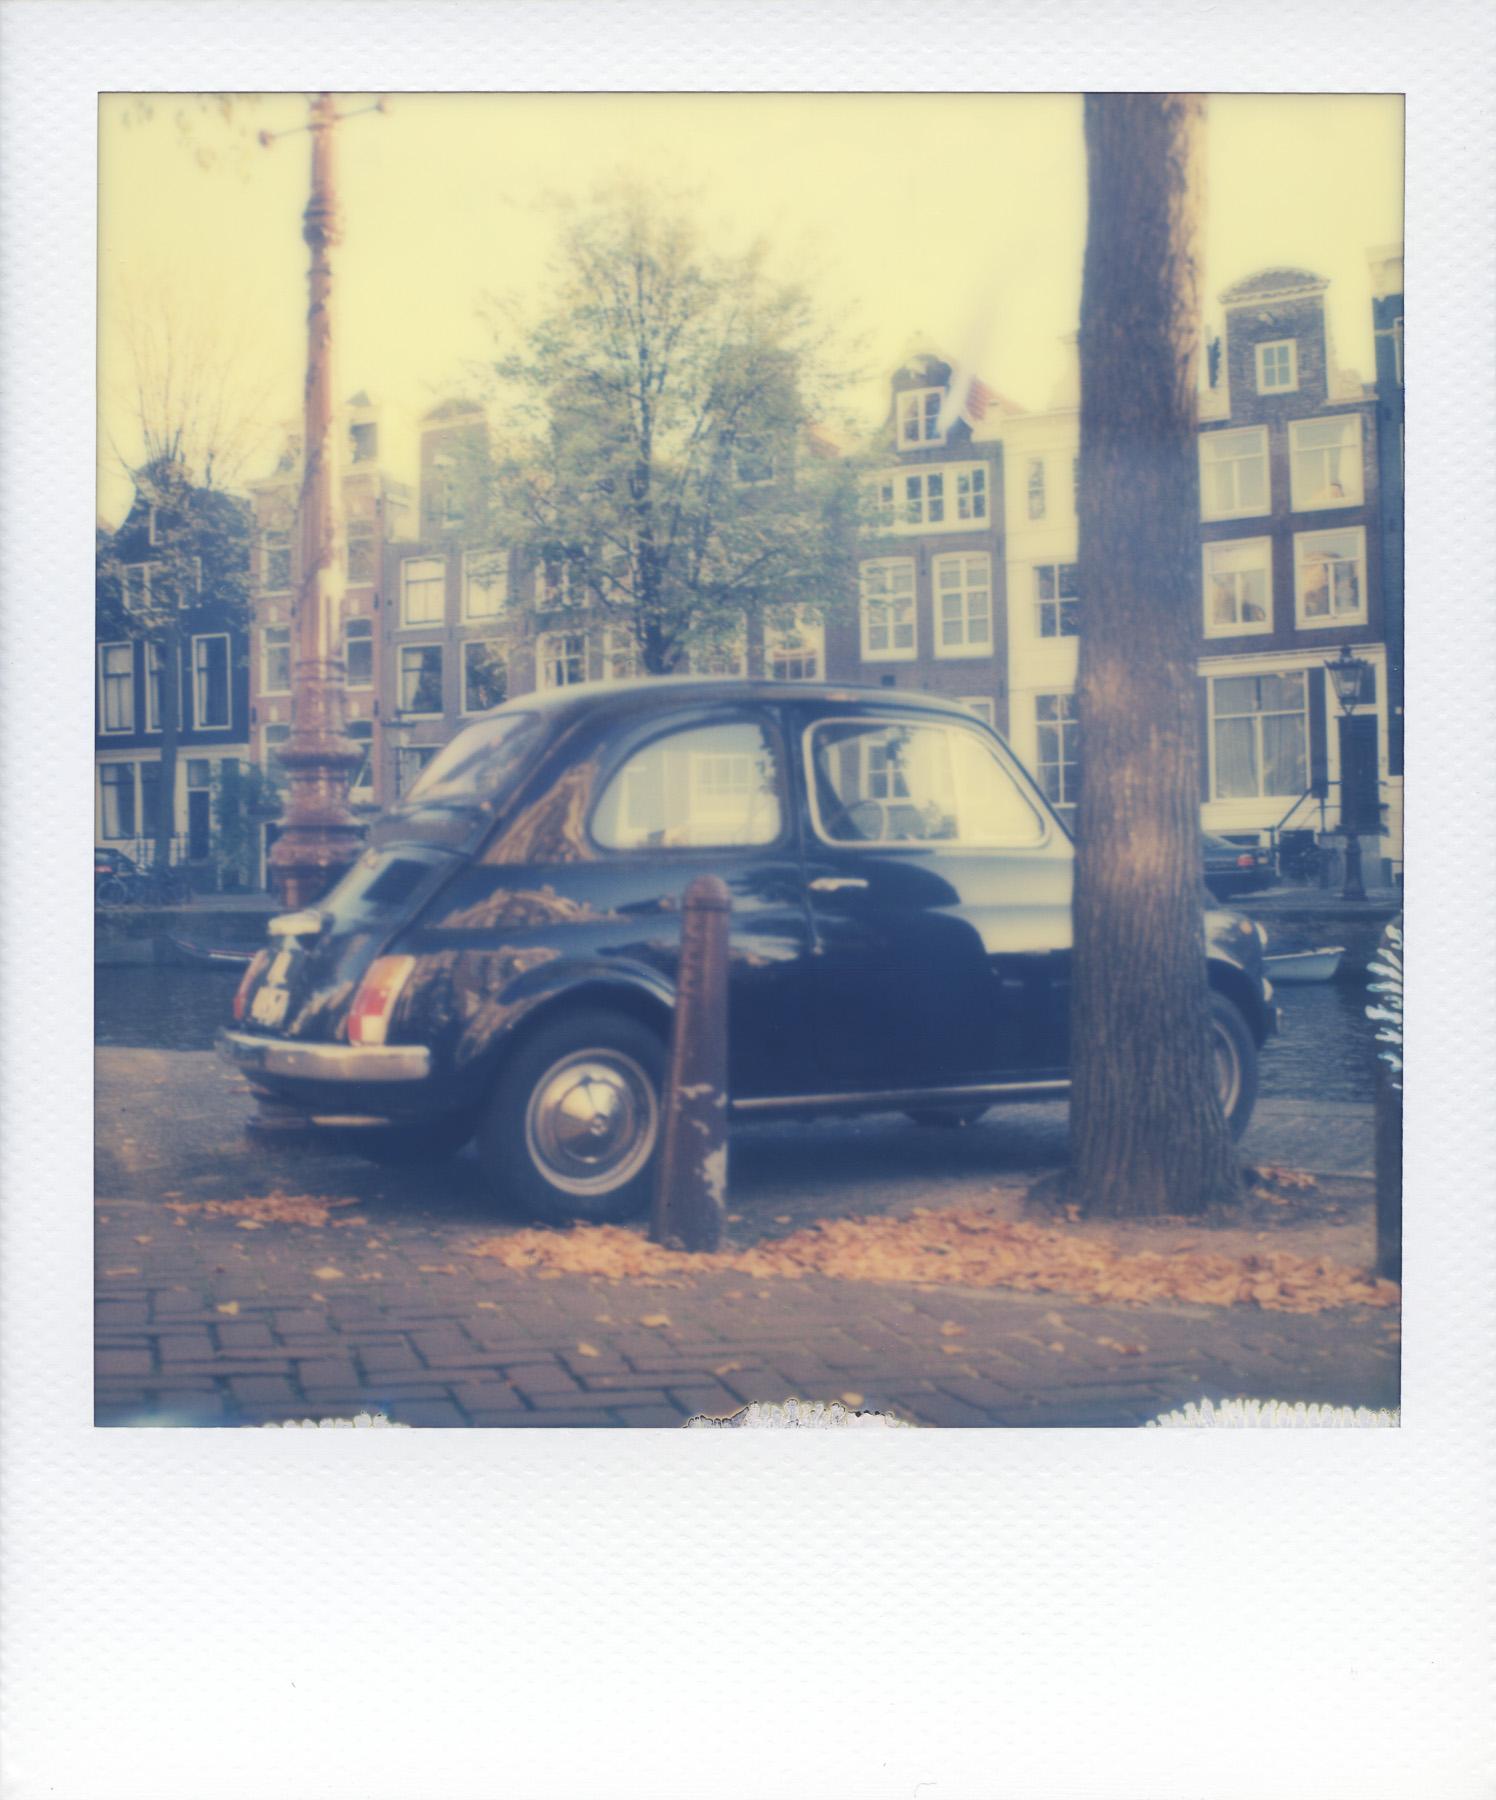 Atlanta and Amsterdam Cars by On a hazy morning